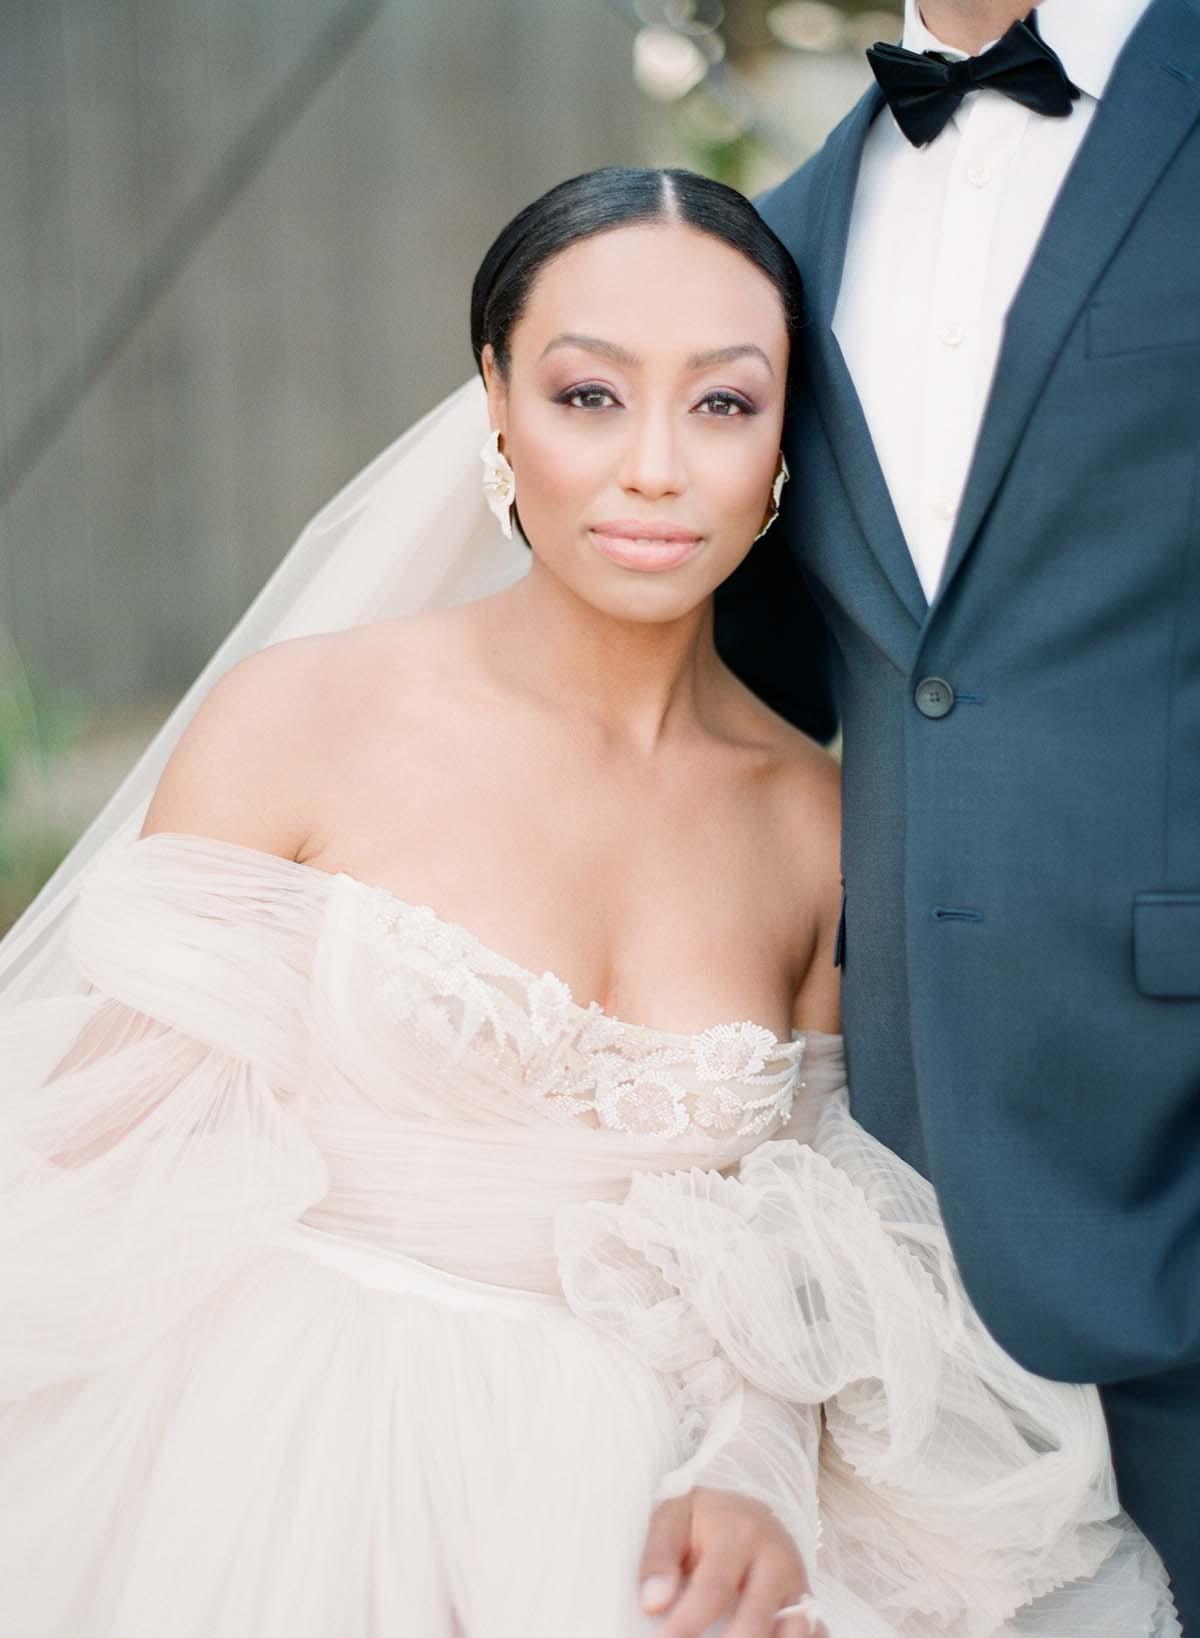 XOXO_BRIDE_Events-Michelle-Beller_Photography_0134